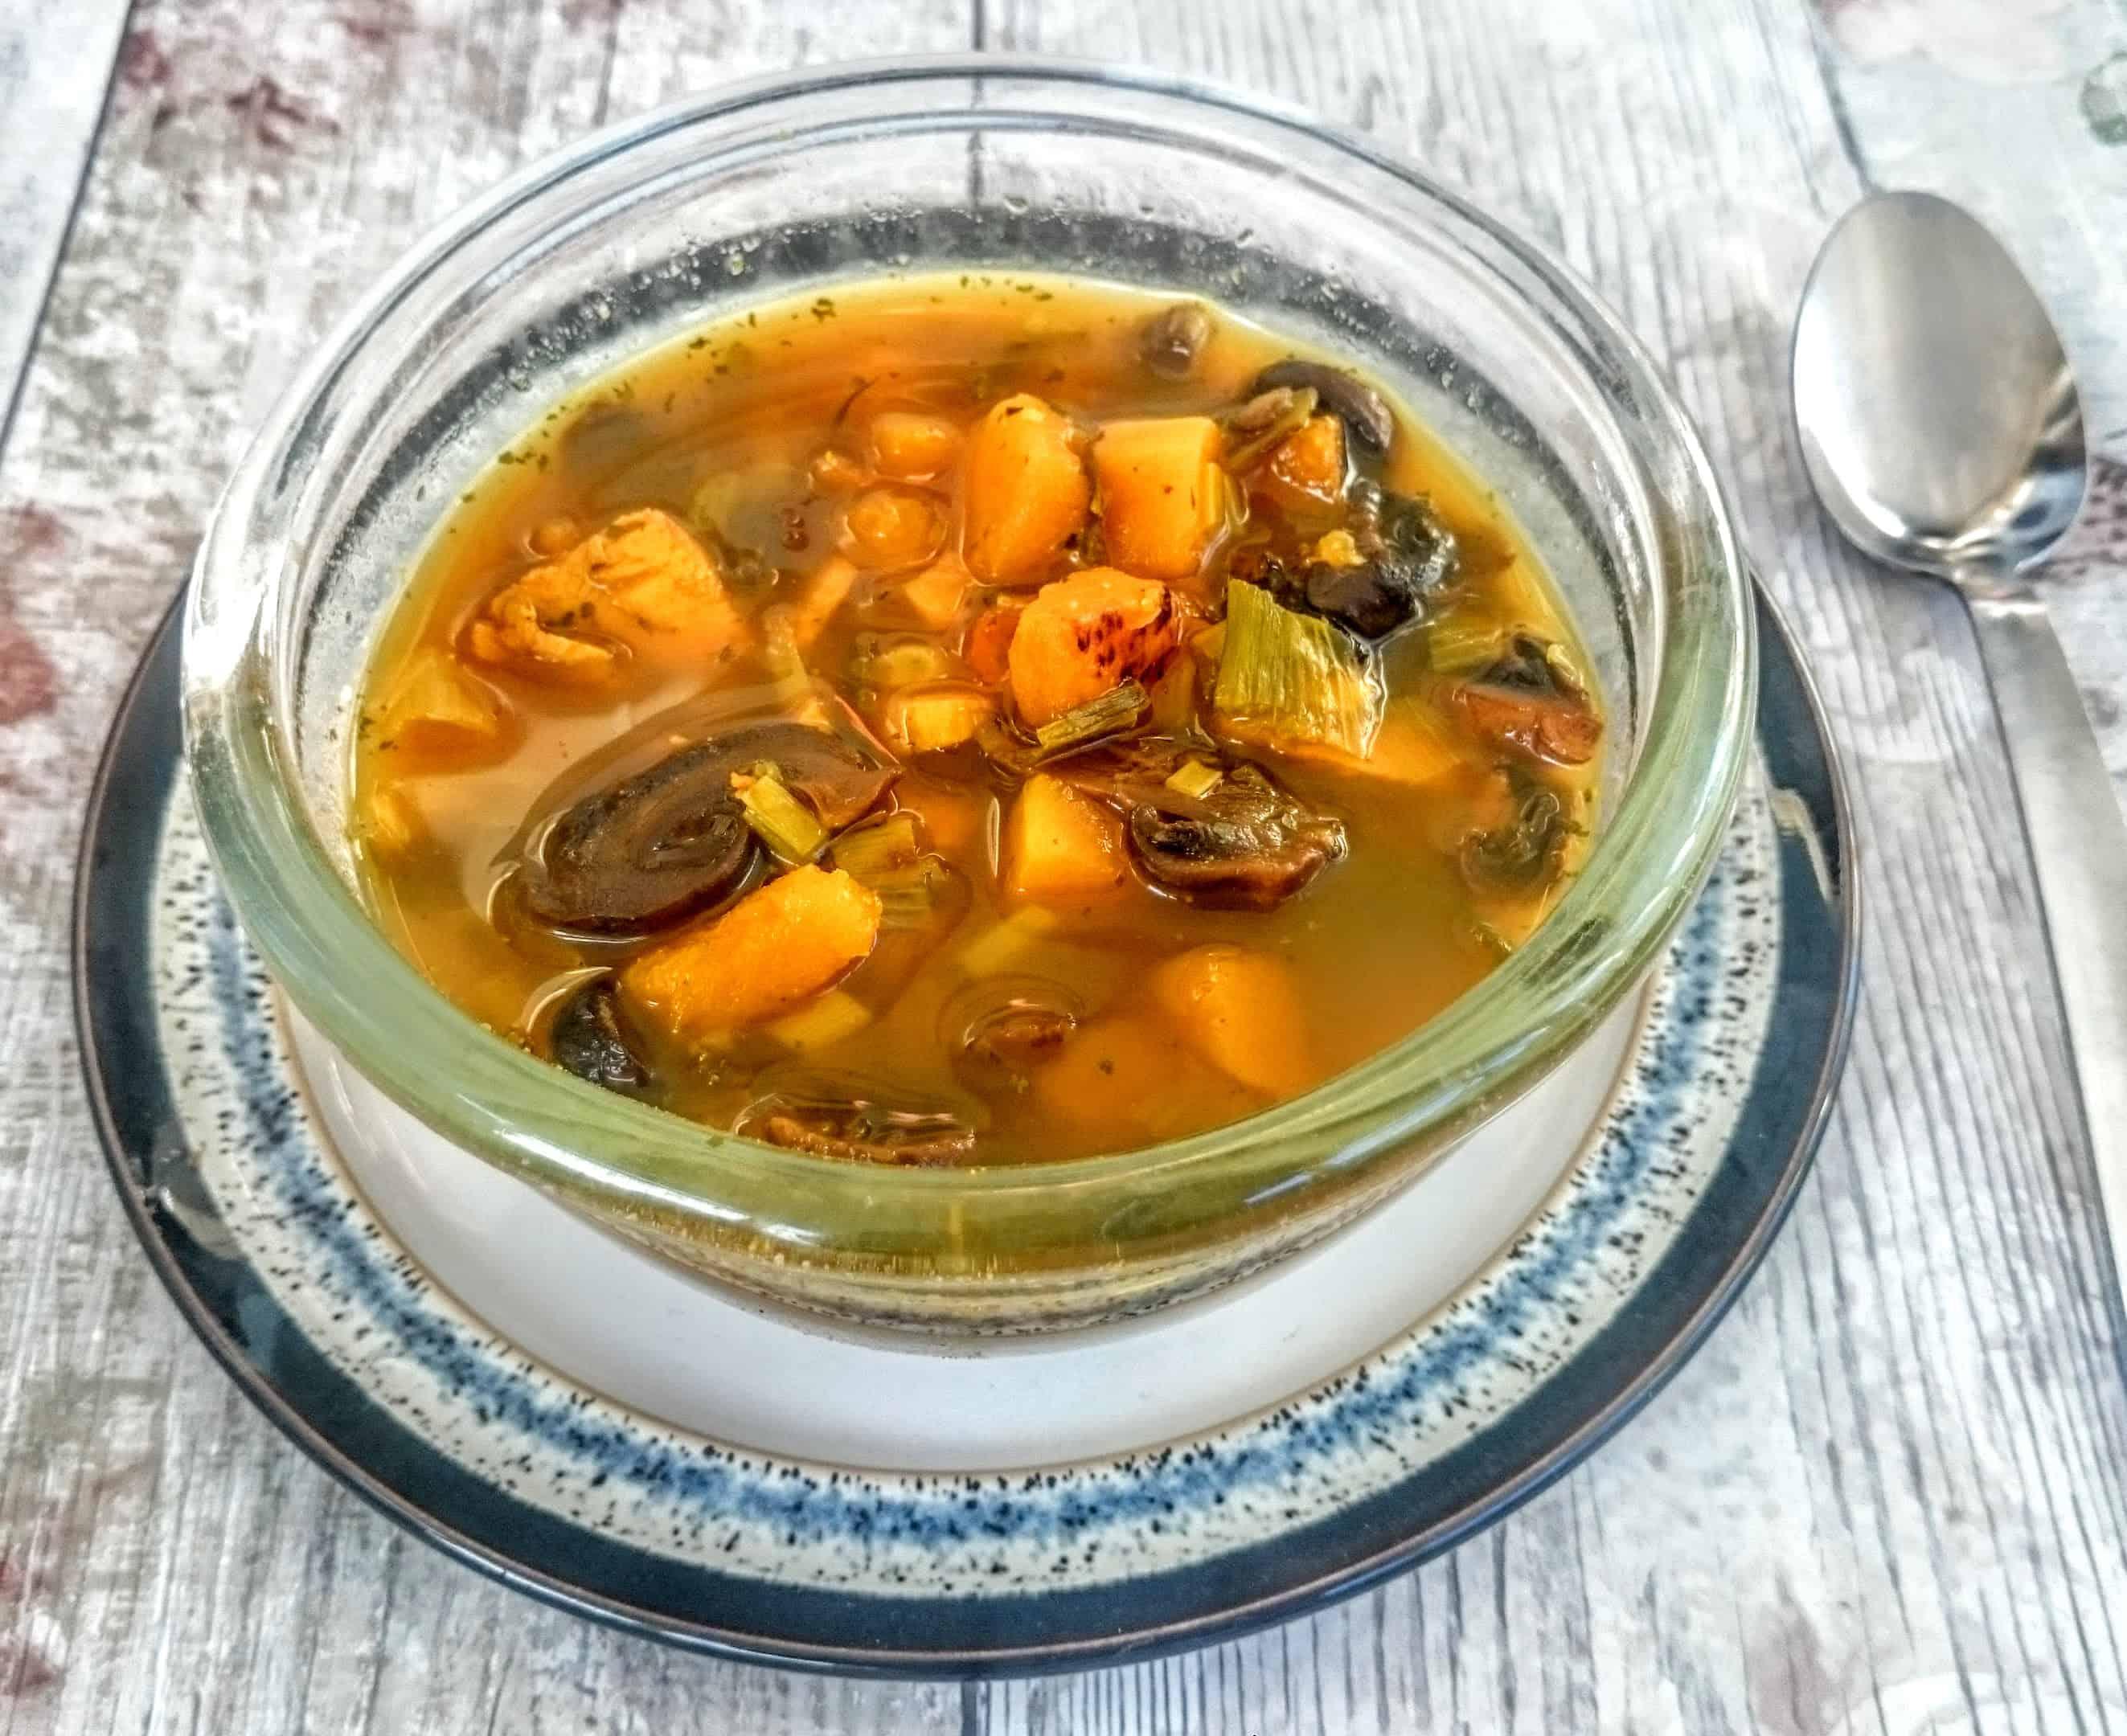 A Bowl of Health: Syn Free Slimming World Chicken, Ginger & Lemon Soup Maker Recipe